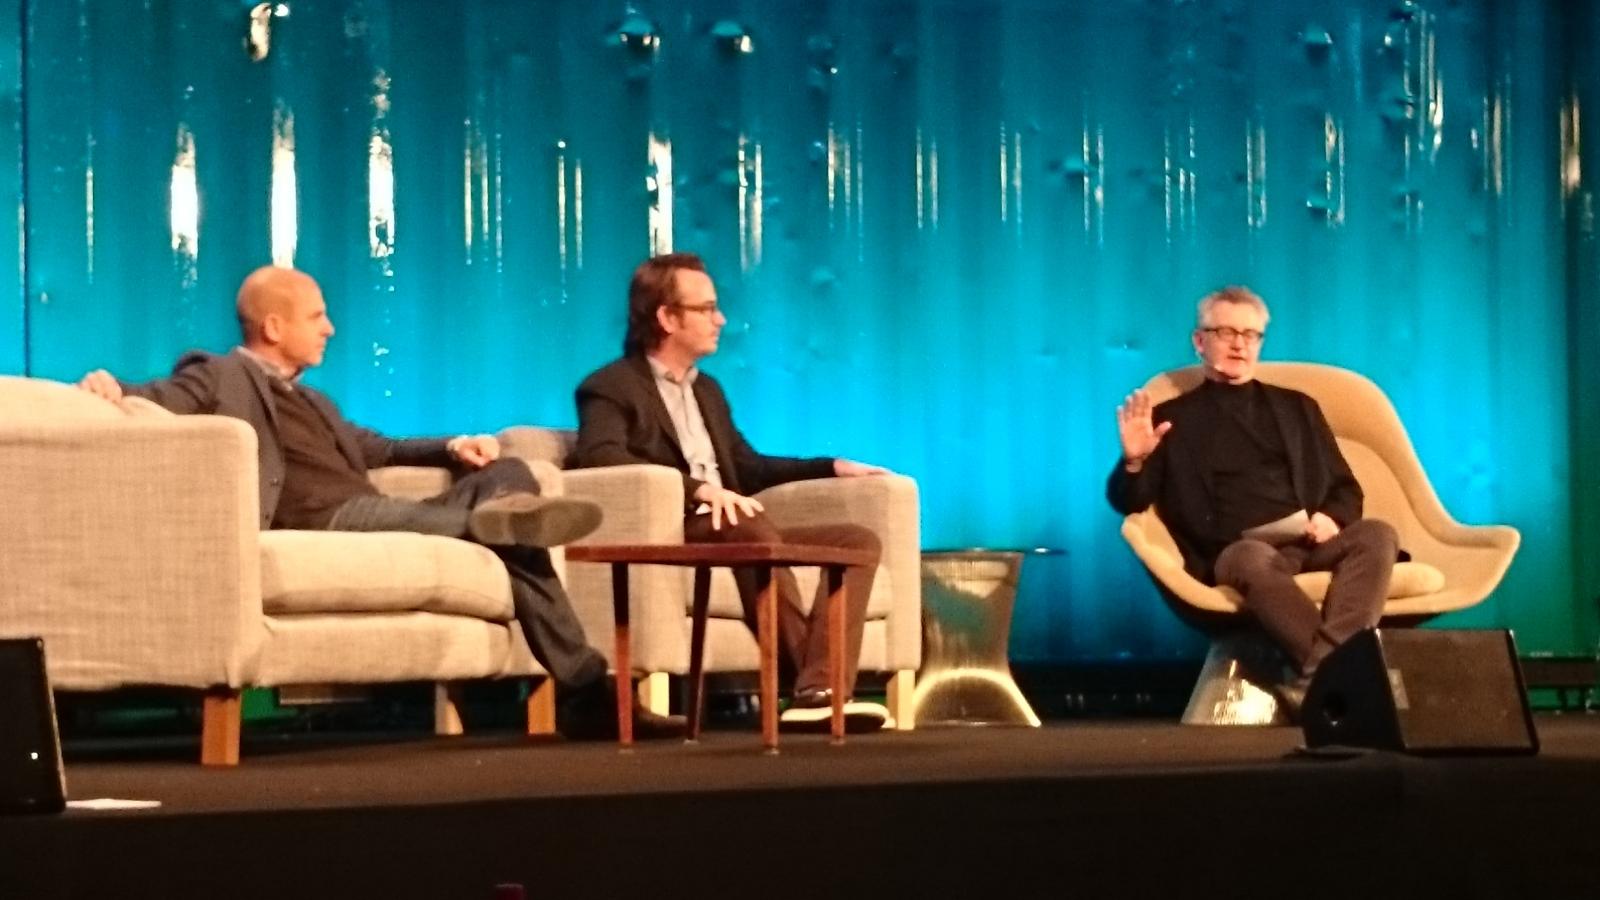 Brent Weinstein (United Talent Agency), Tom Ryan (Pluto TV), Russ Mitchell (LA Times).